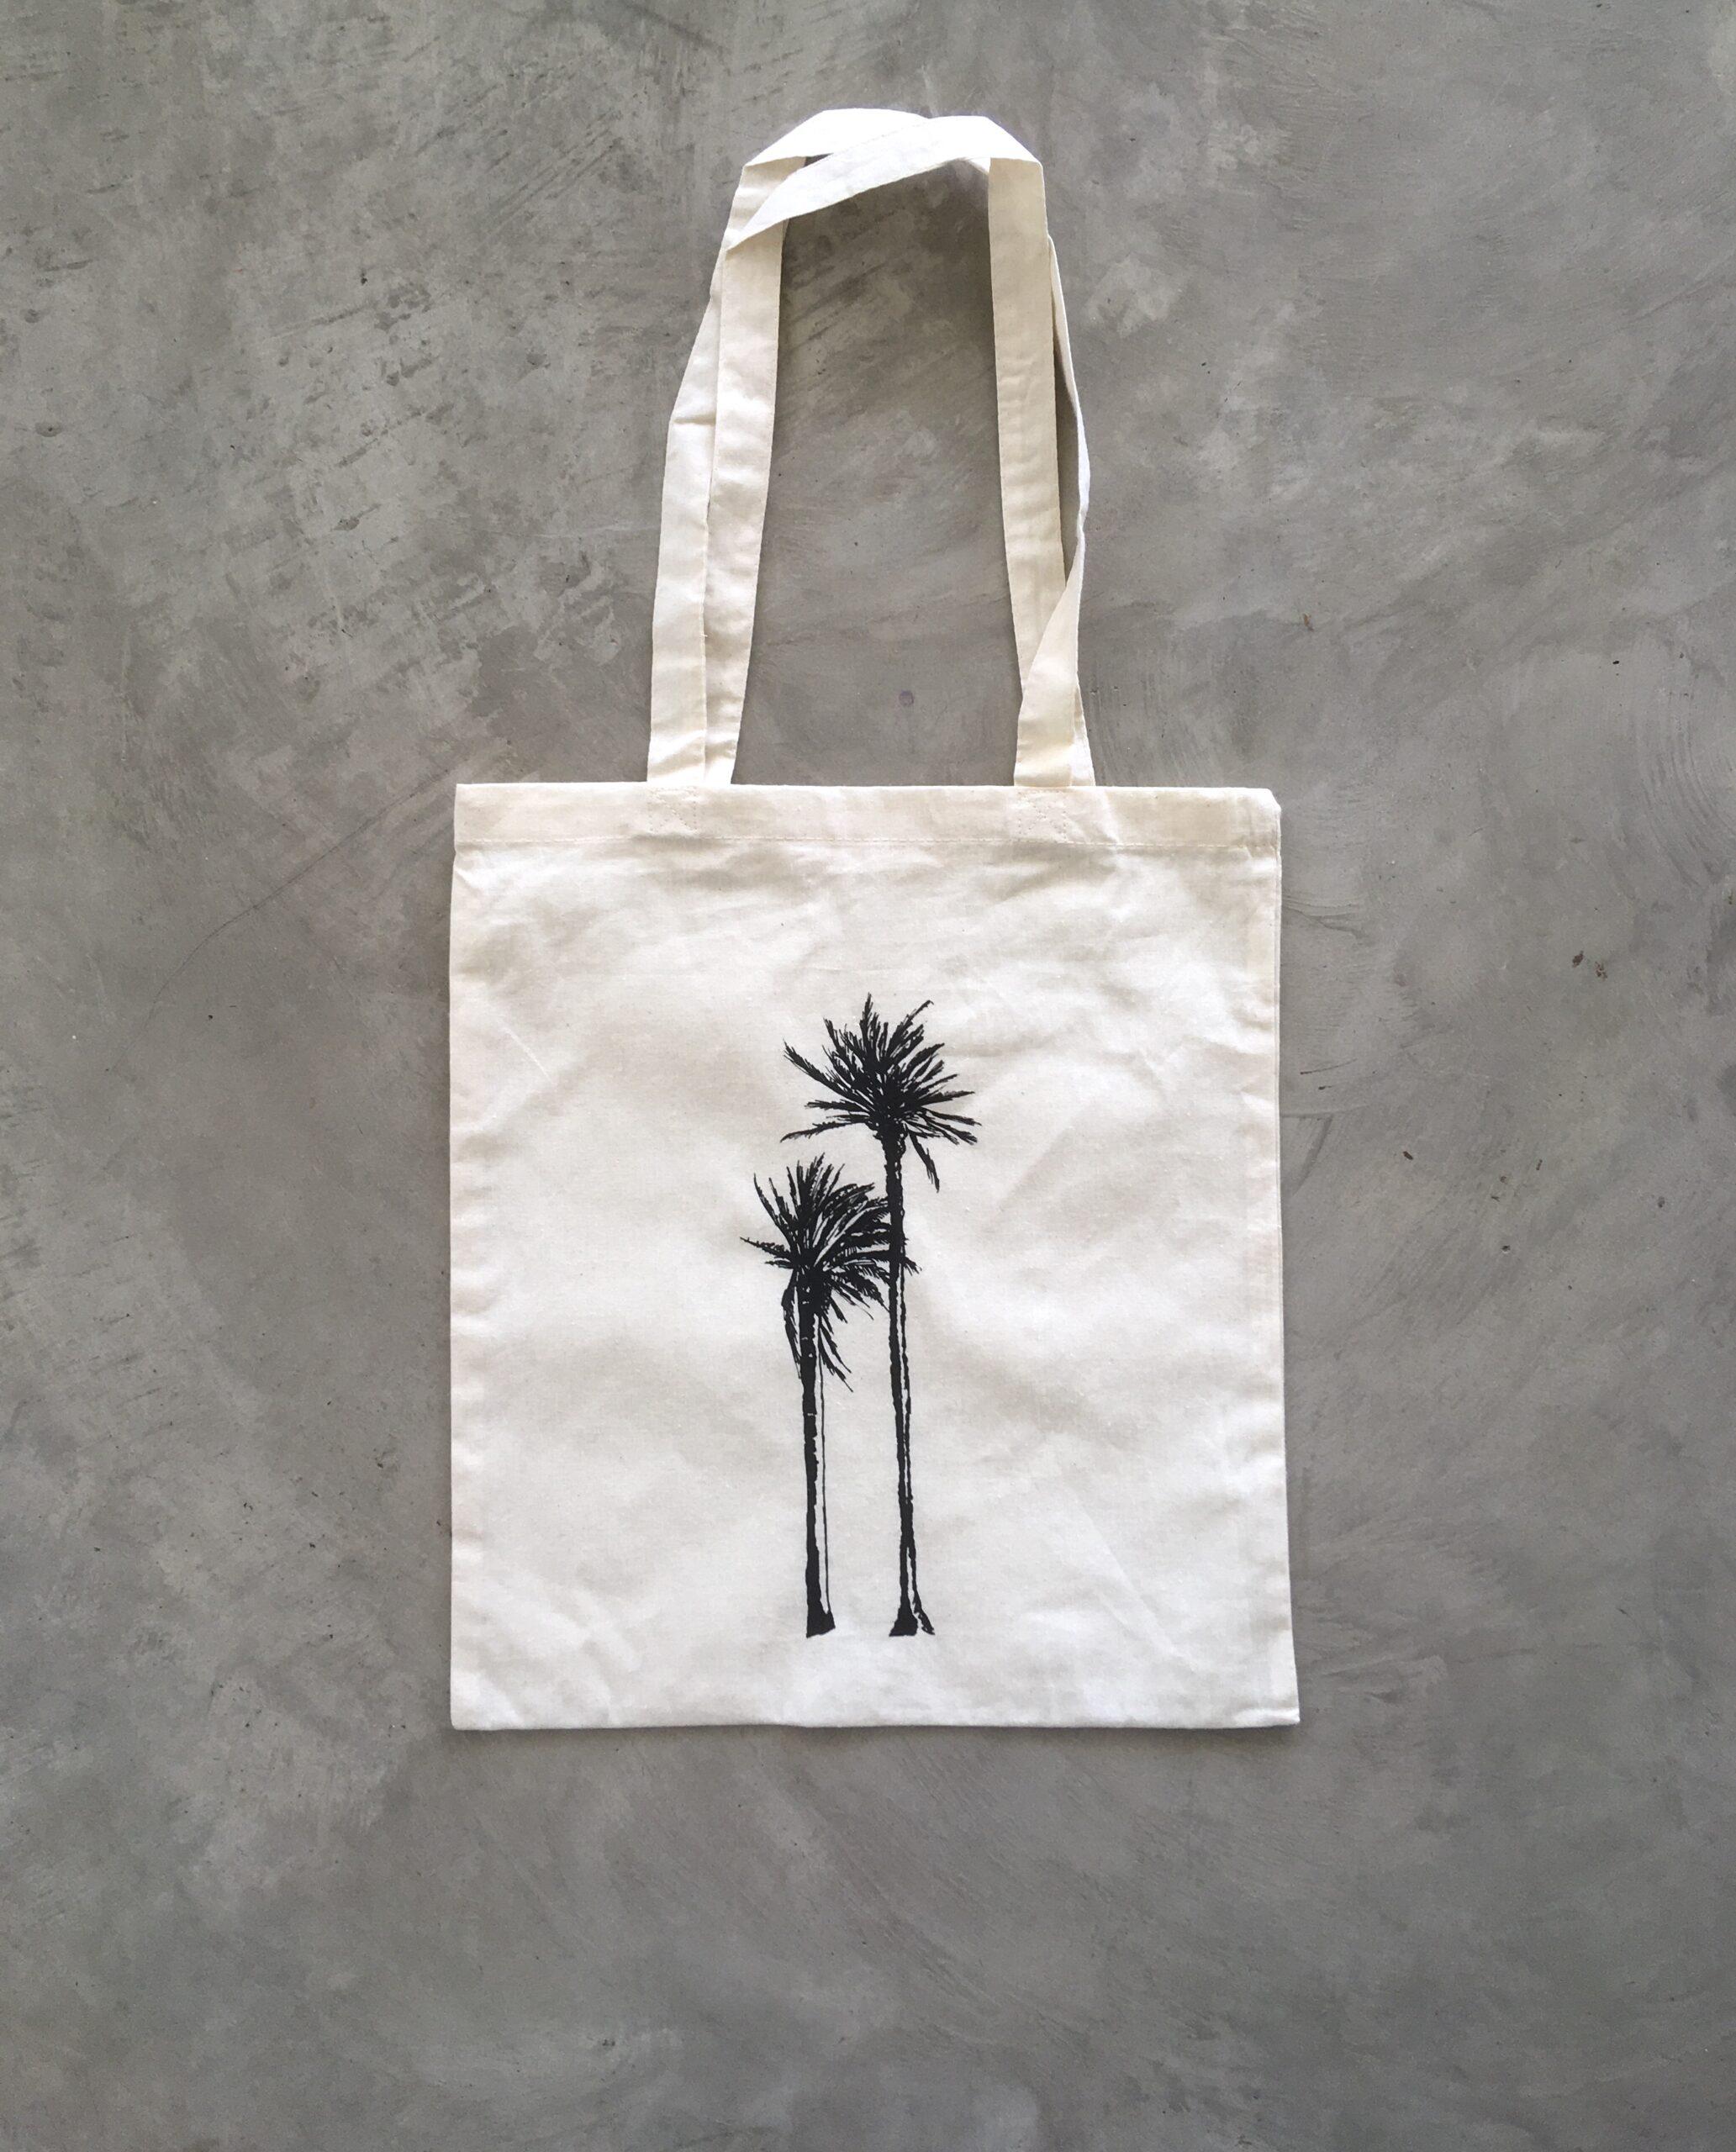 tote-bag-palmera-barco-print